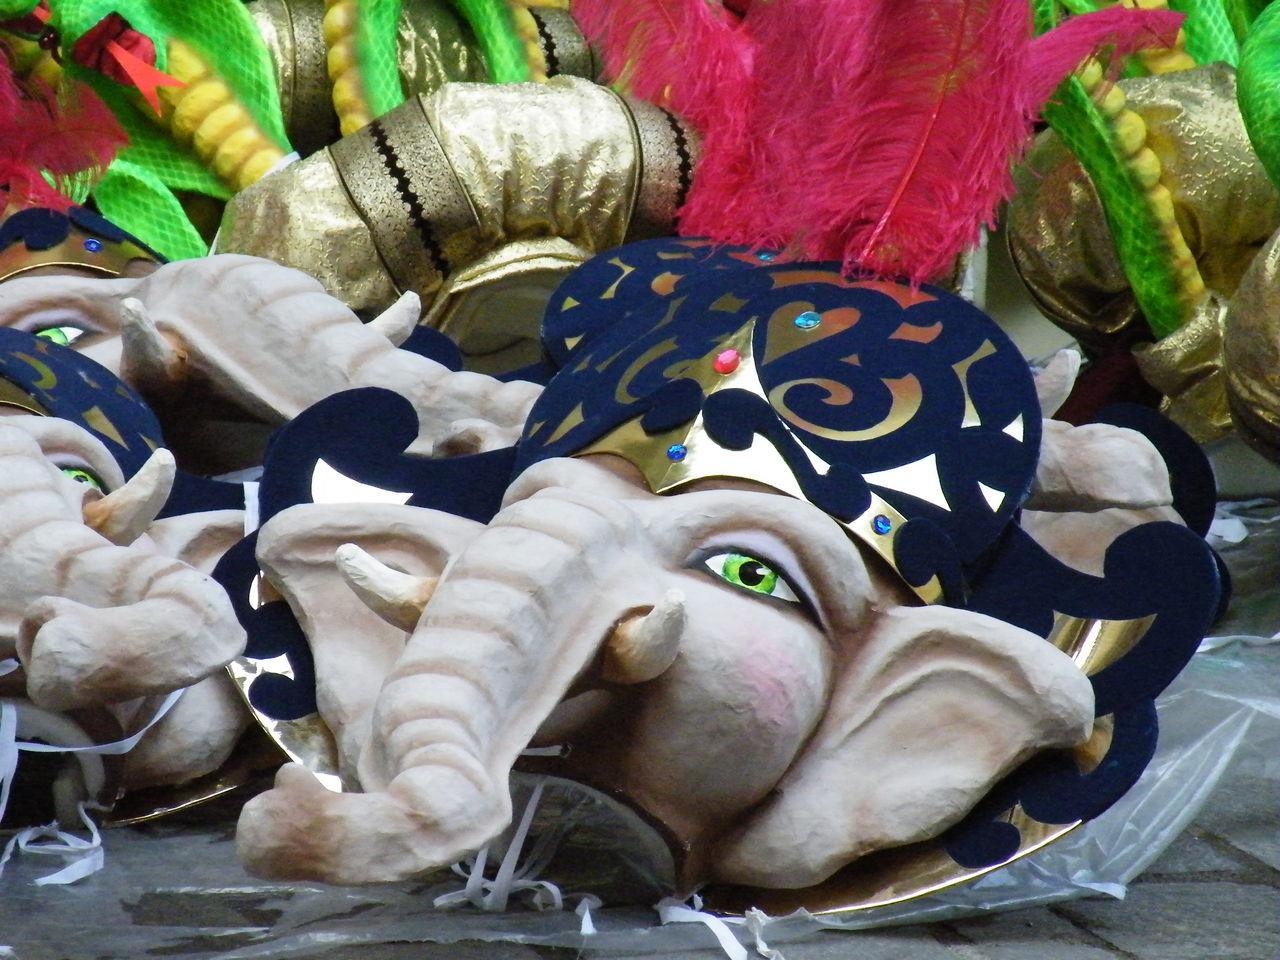 Animal Representation Animal Themes Art Art And Craft Carnival